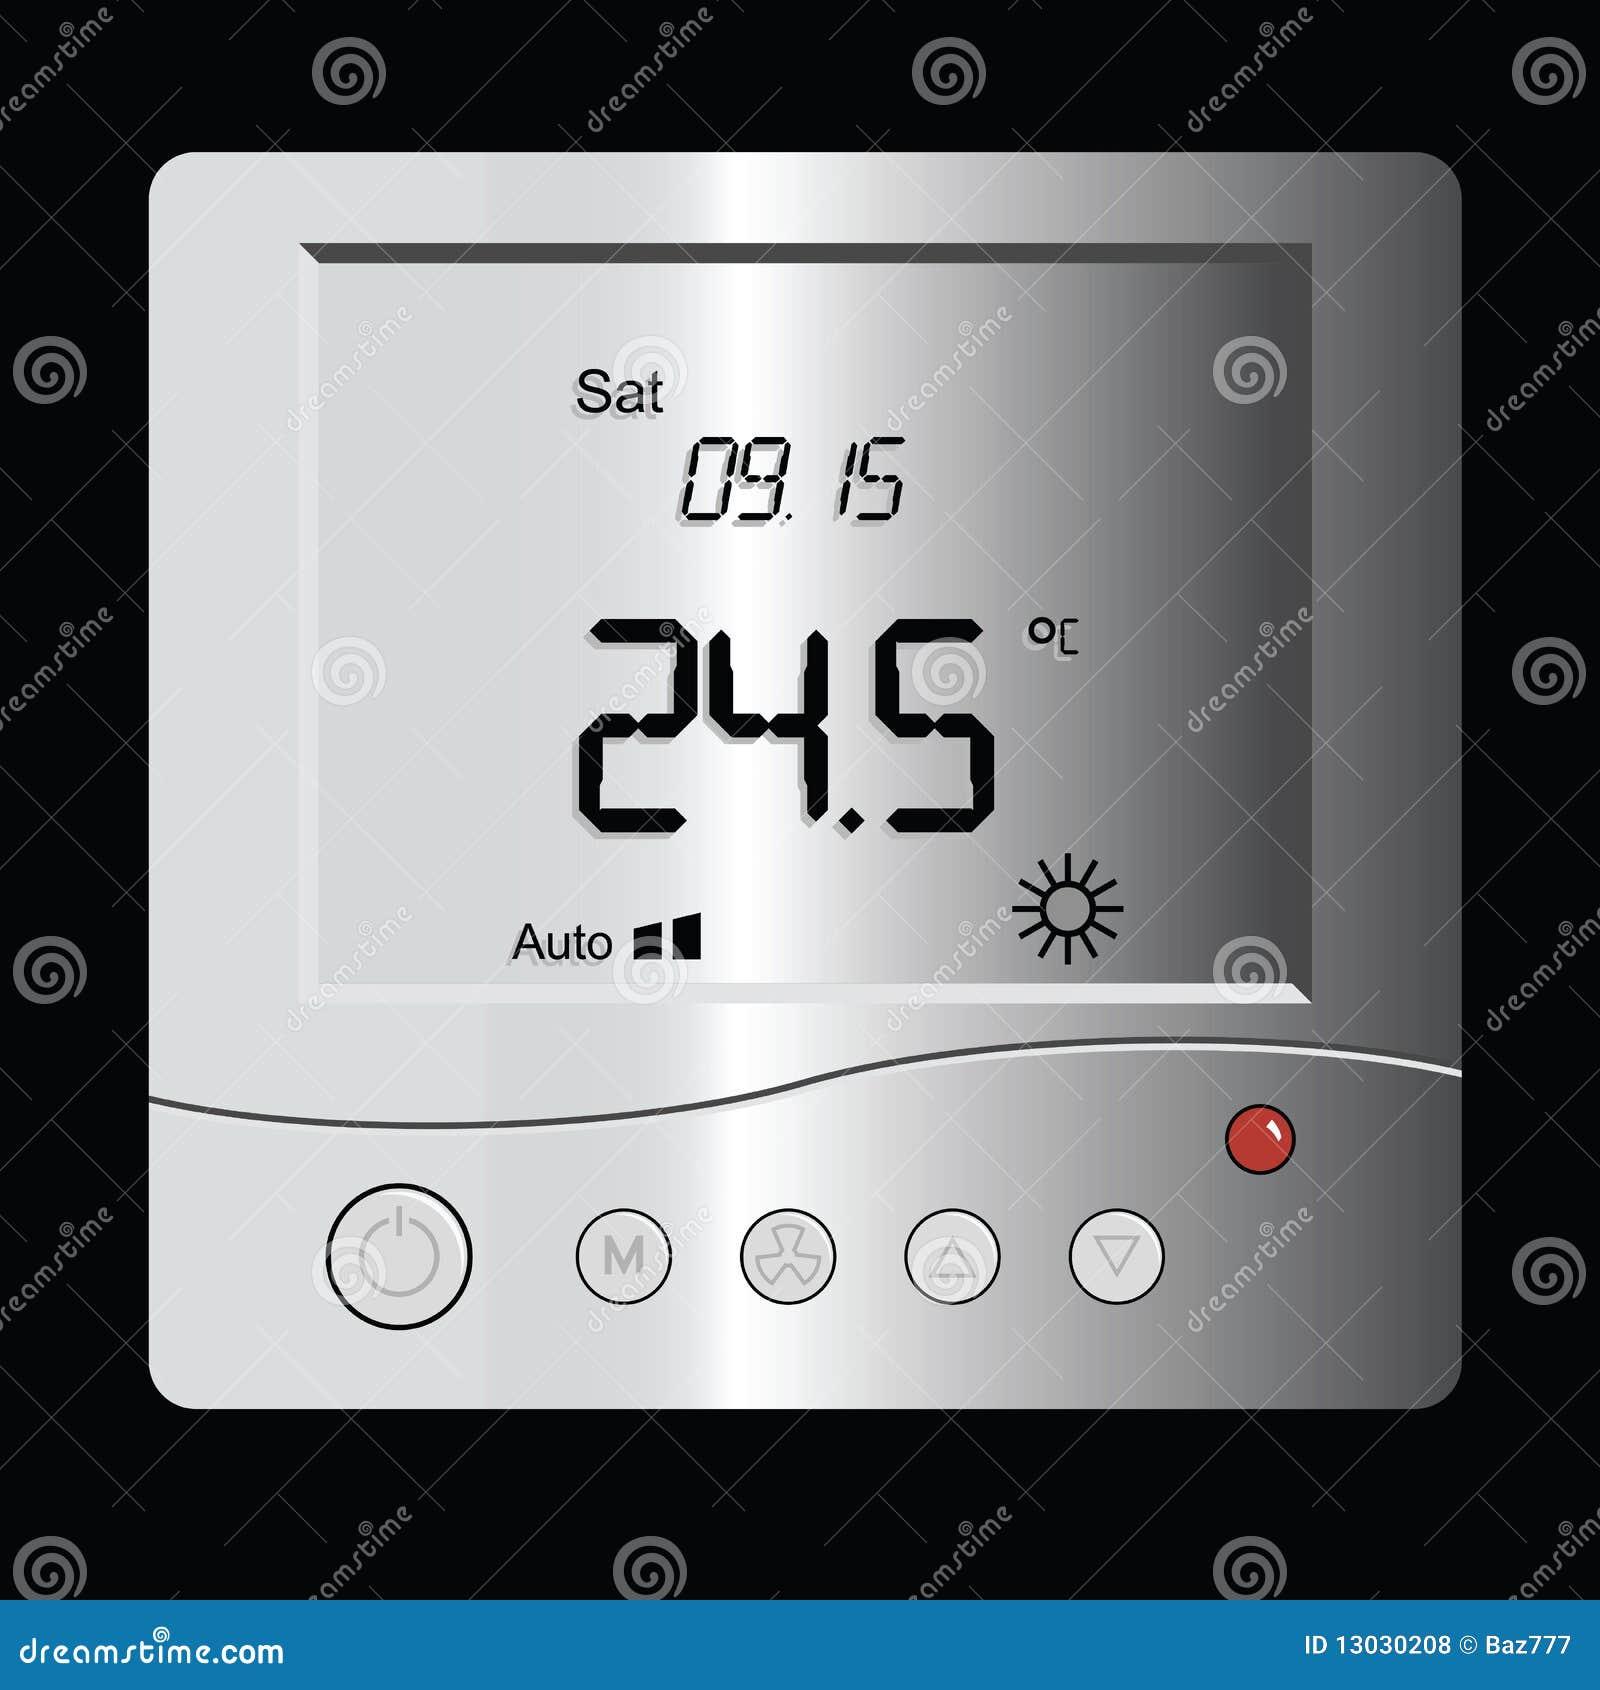 Digital Thermostat Royalty Free Stock Photos